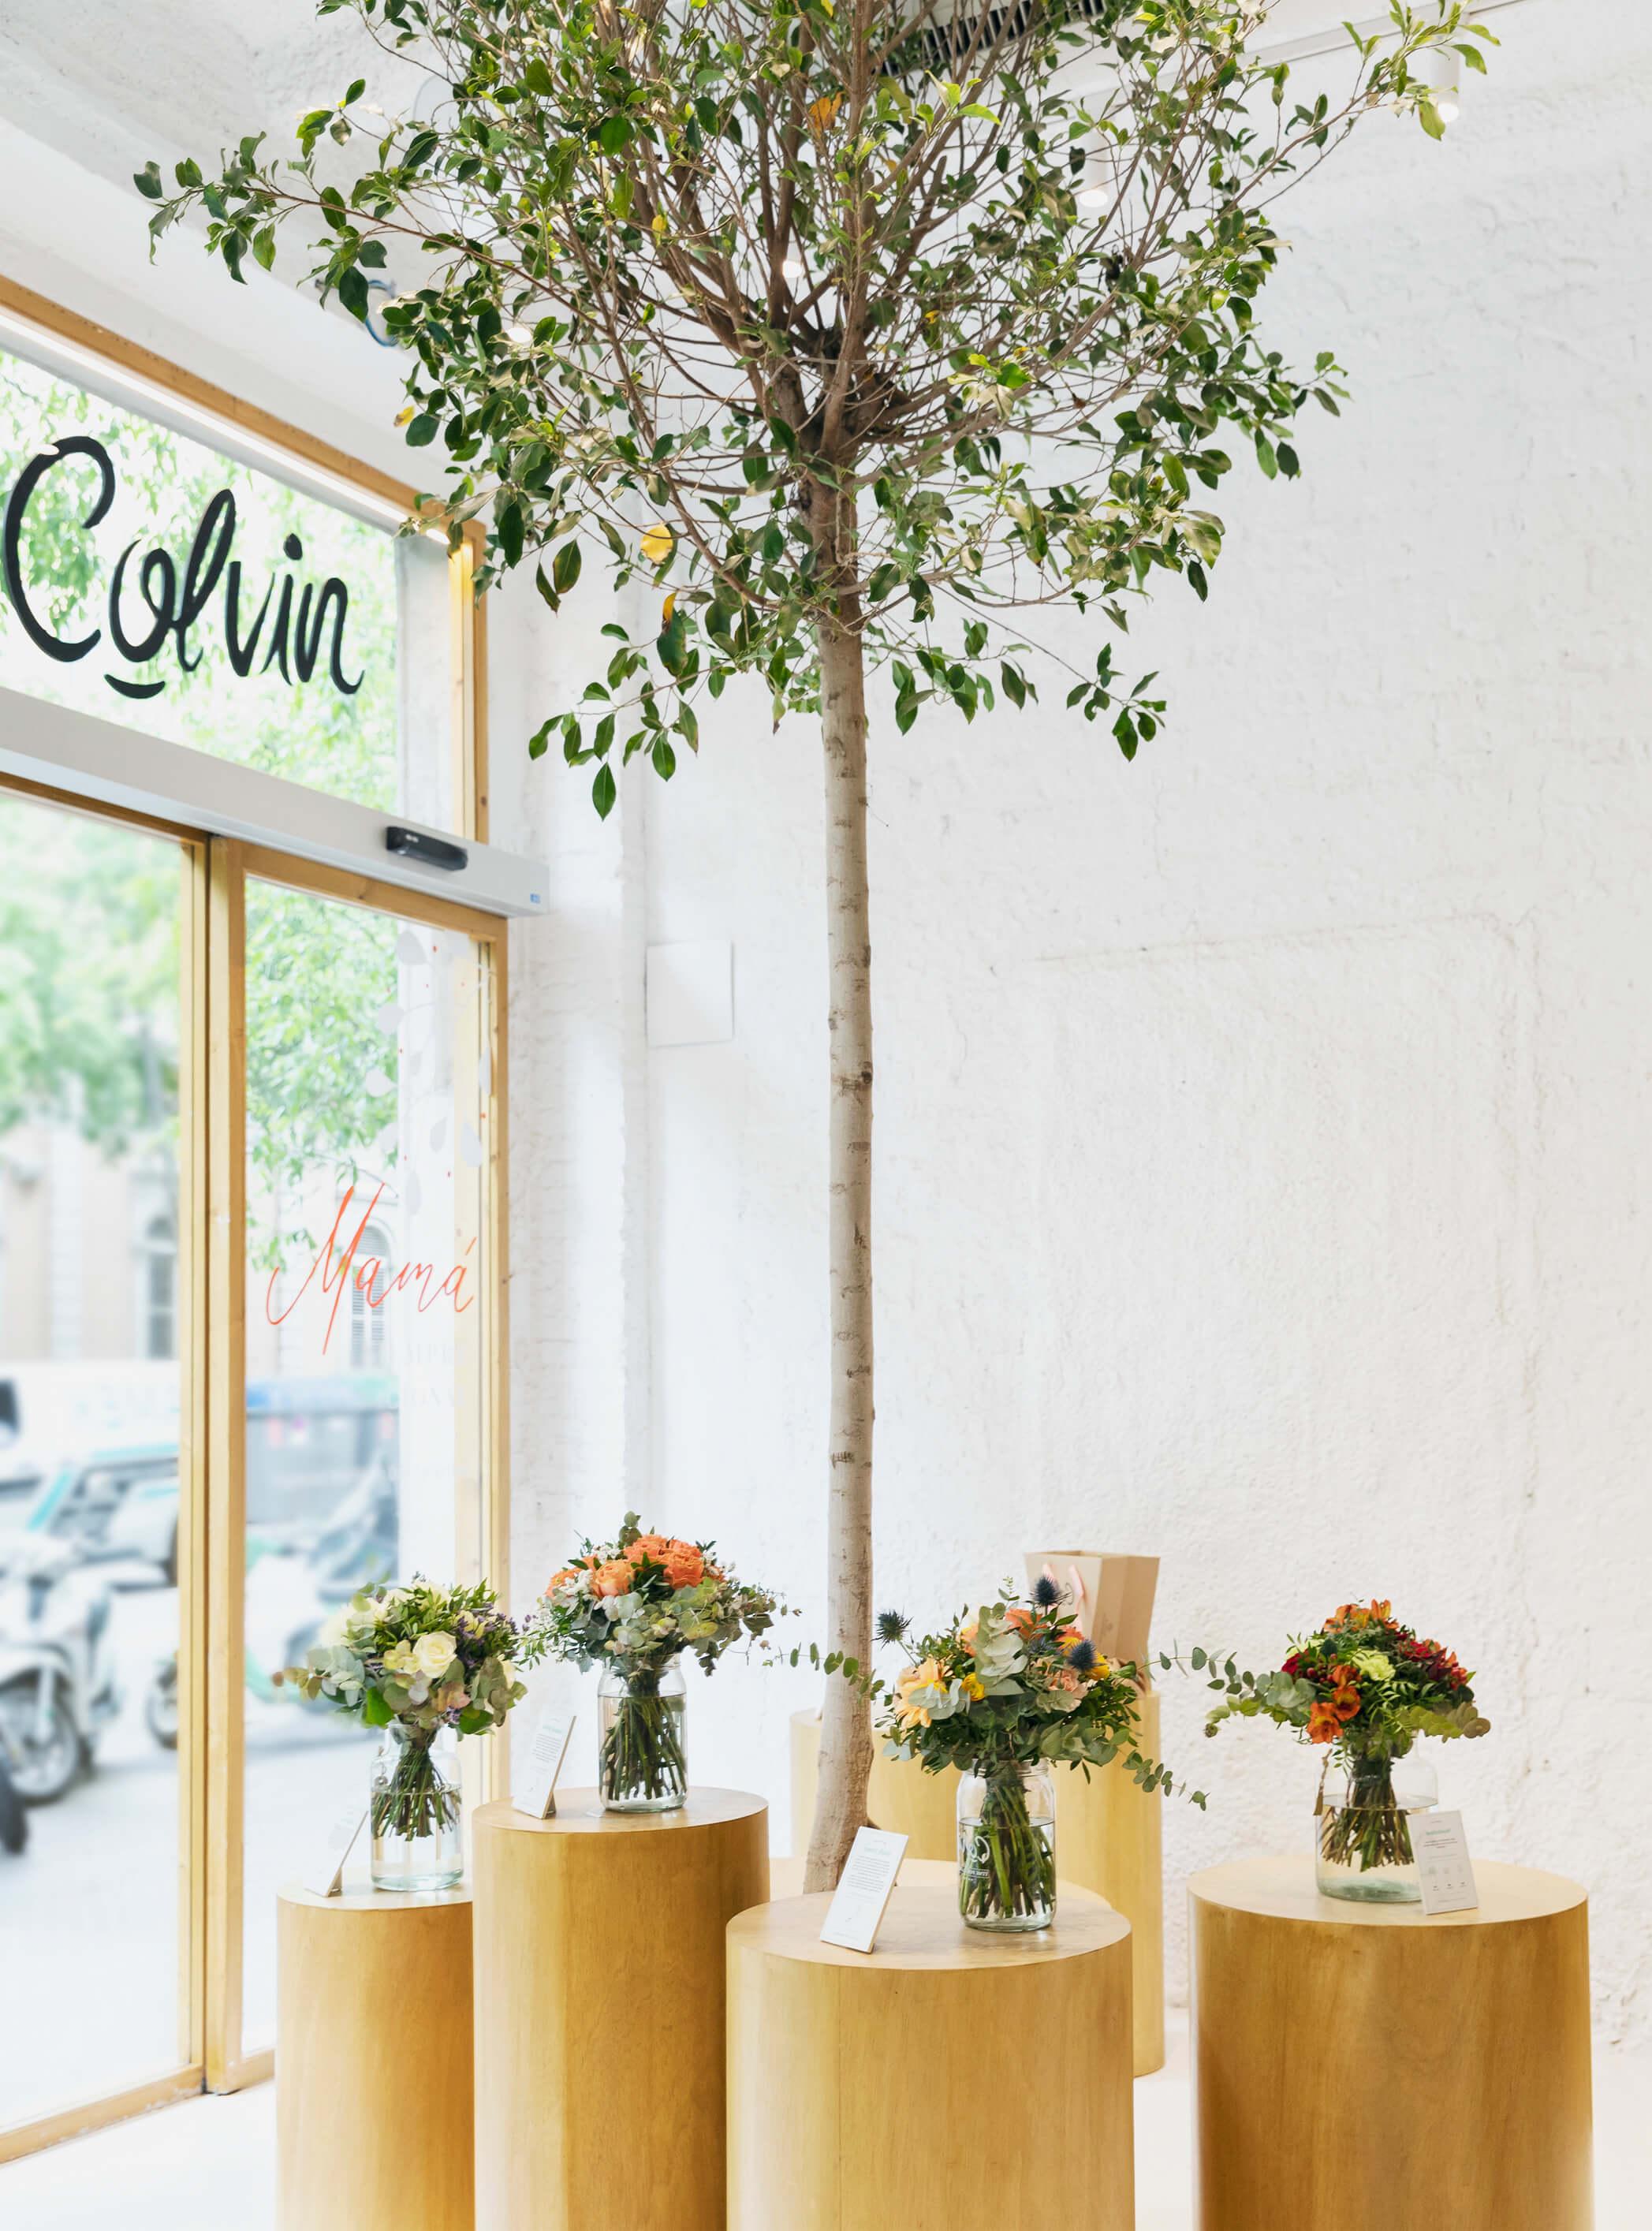 tienda colvin barcelona